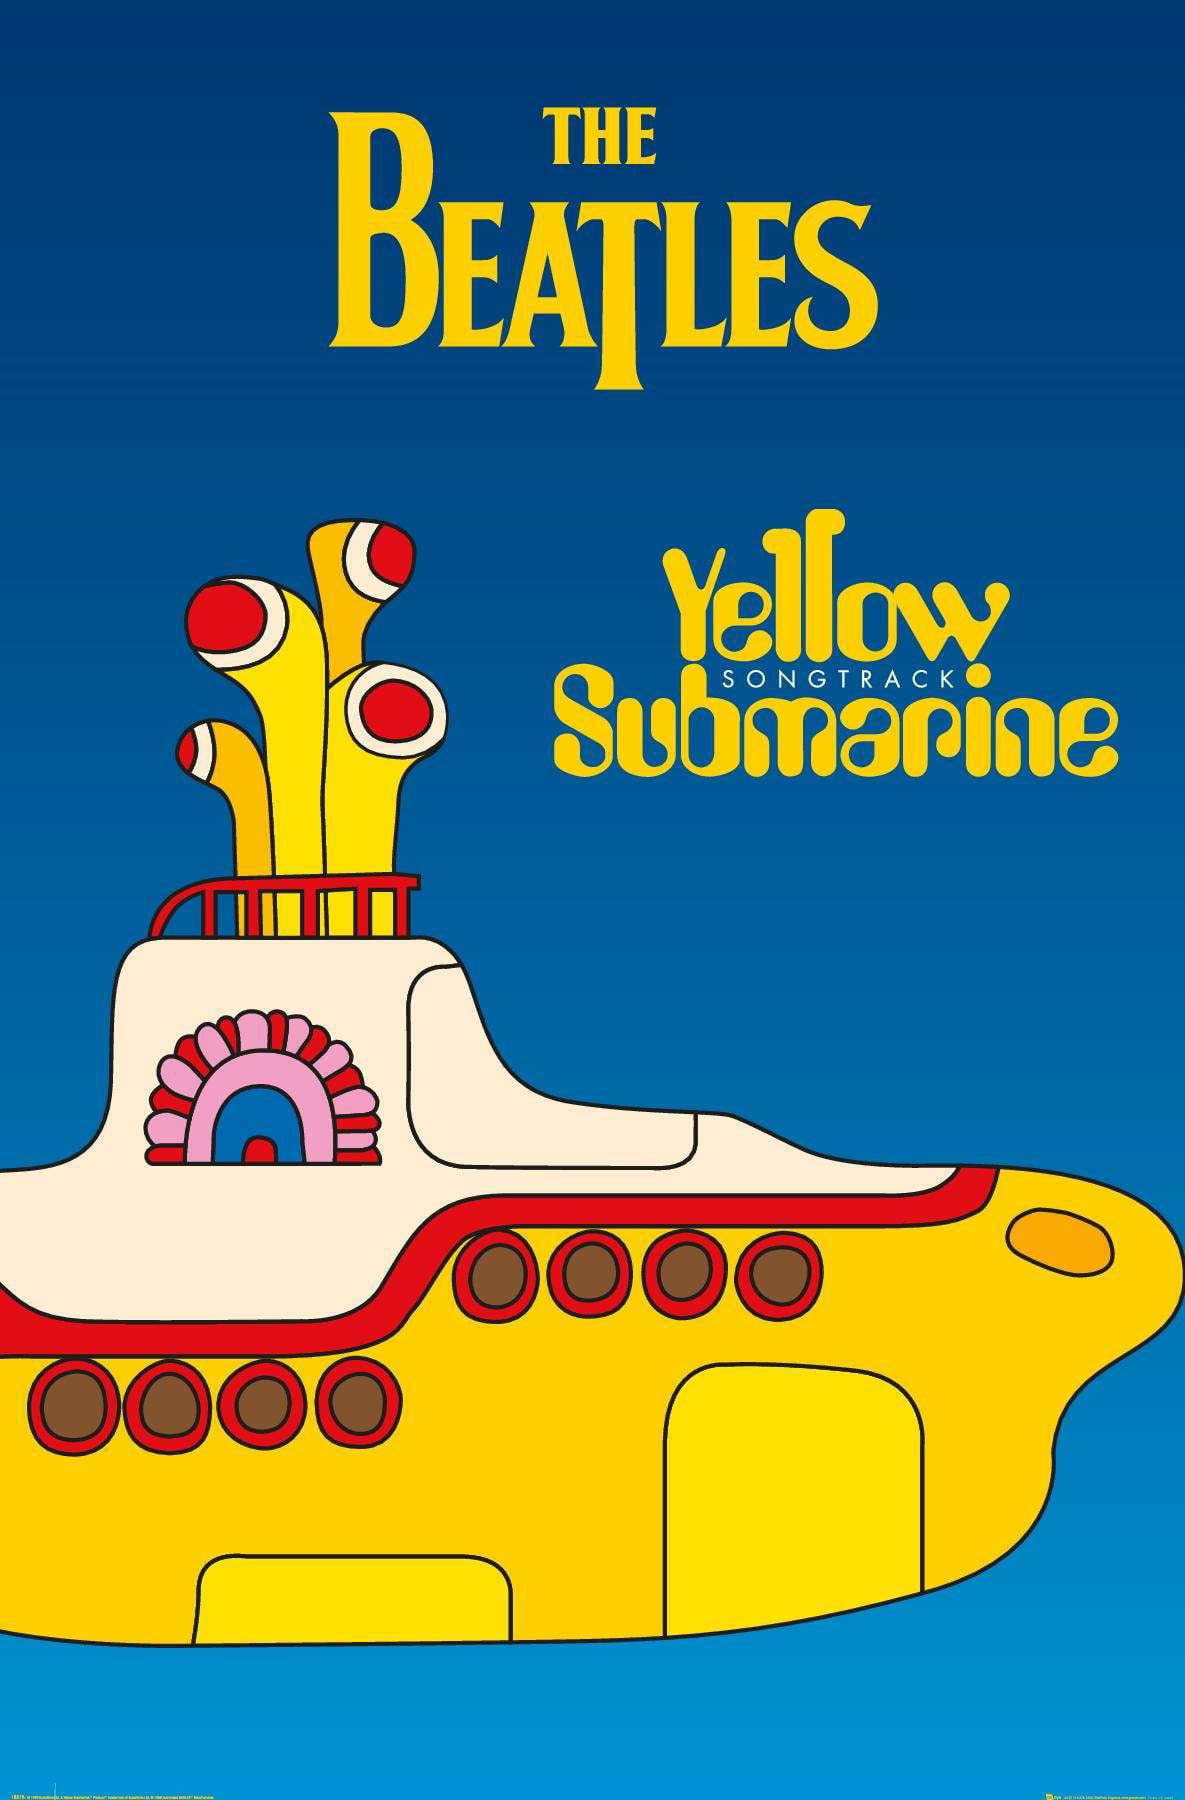 The Beatles - Yellow Submarine (24X36) Poster - Walmart